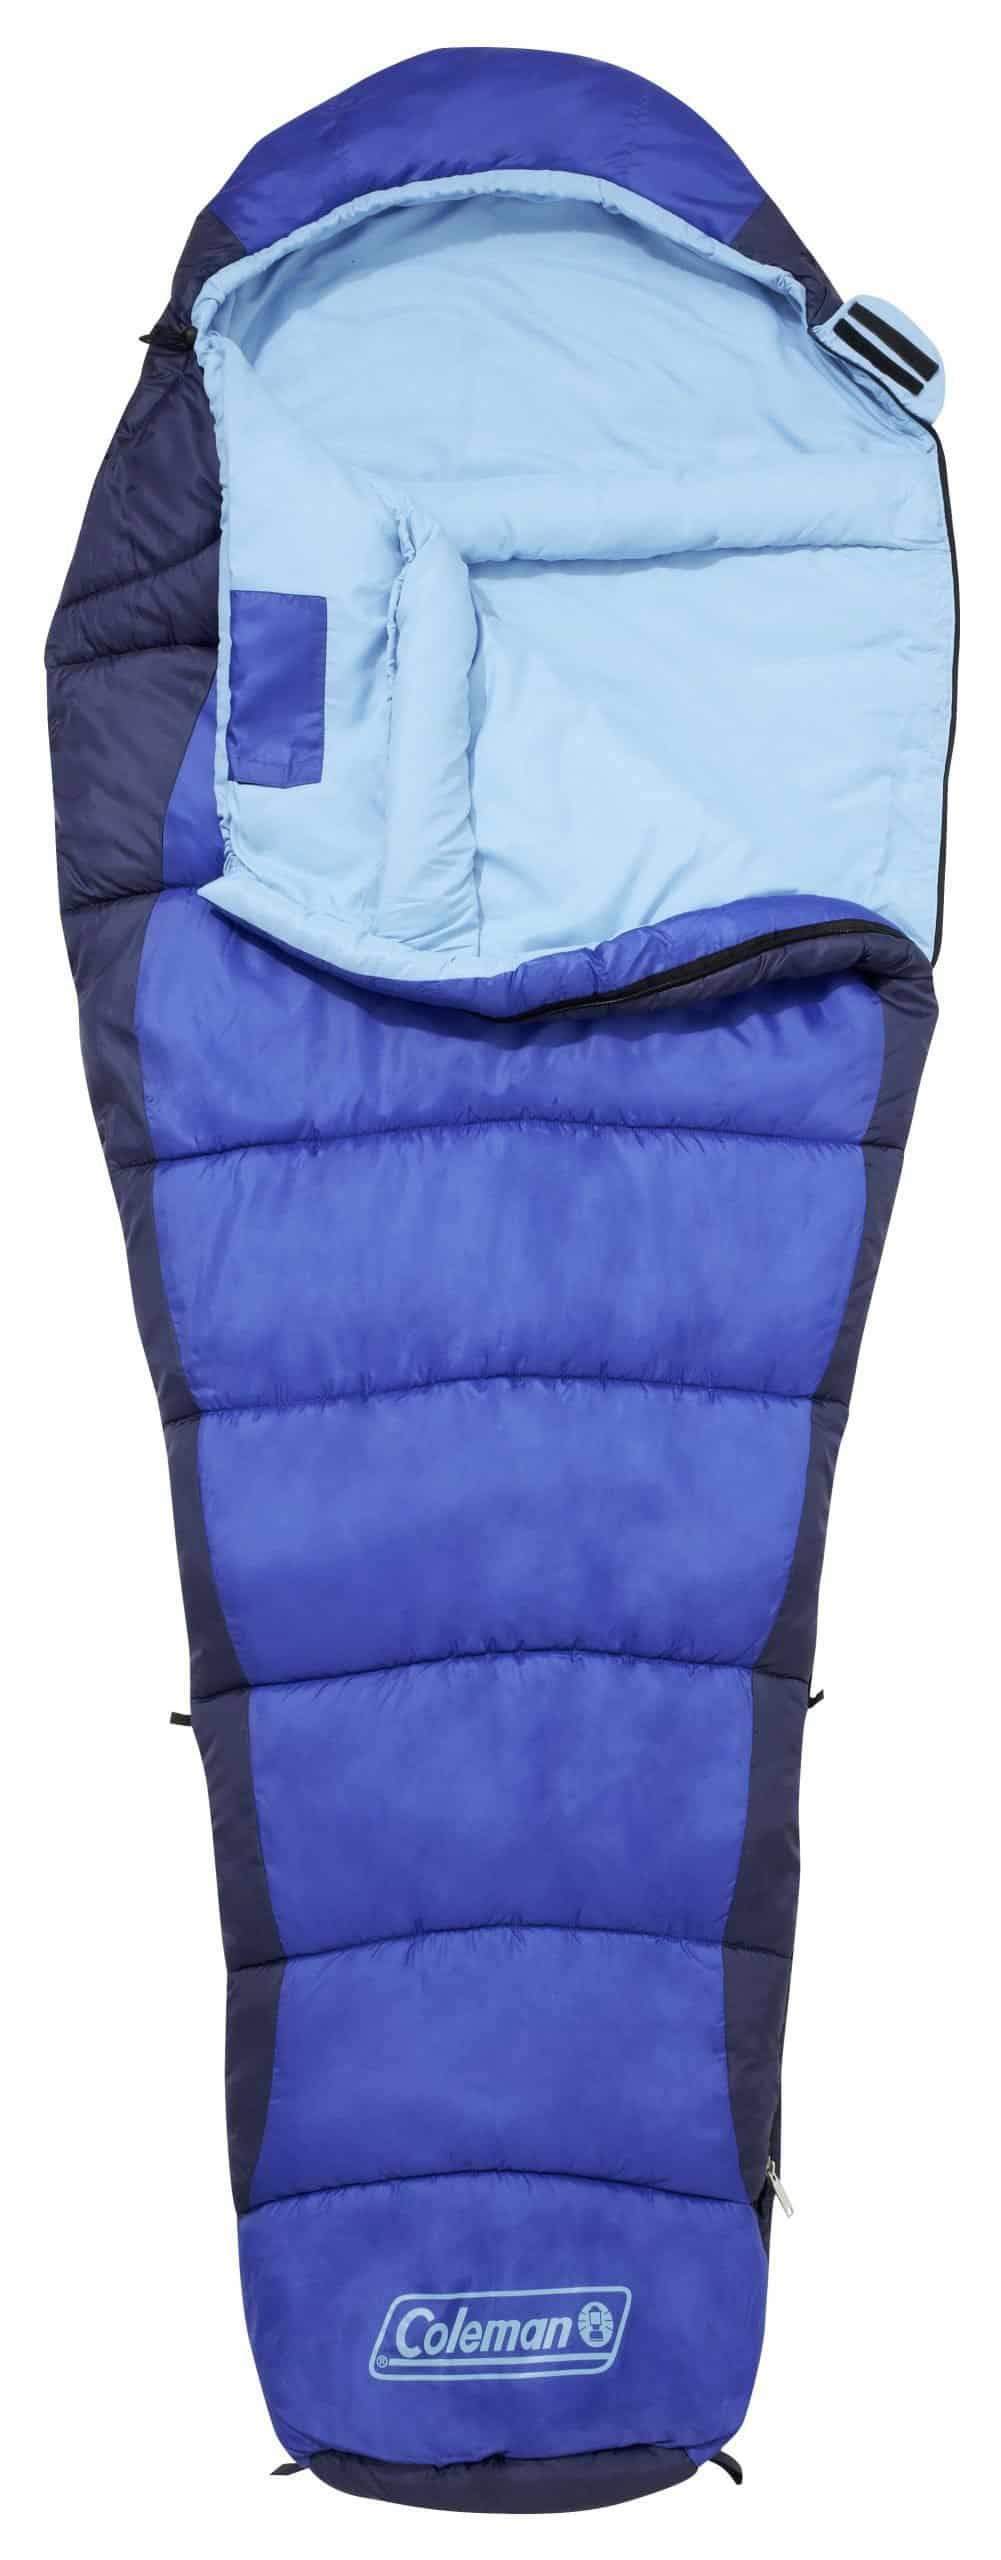 Coleman Sleeping Bag Mummy Fision 100 Warm Cold